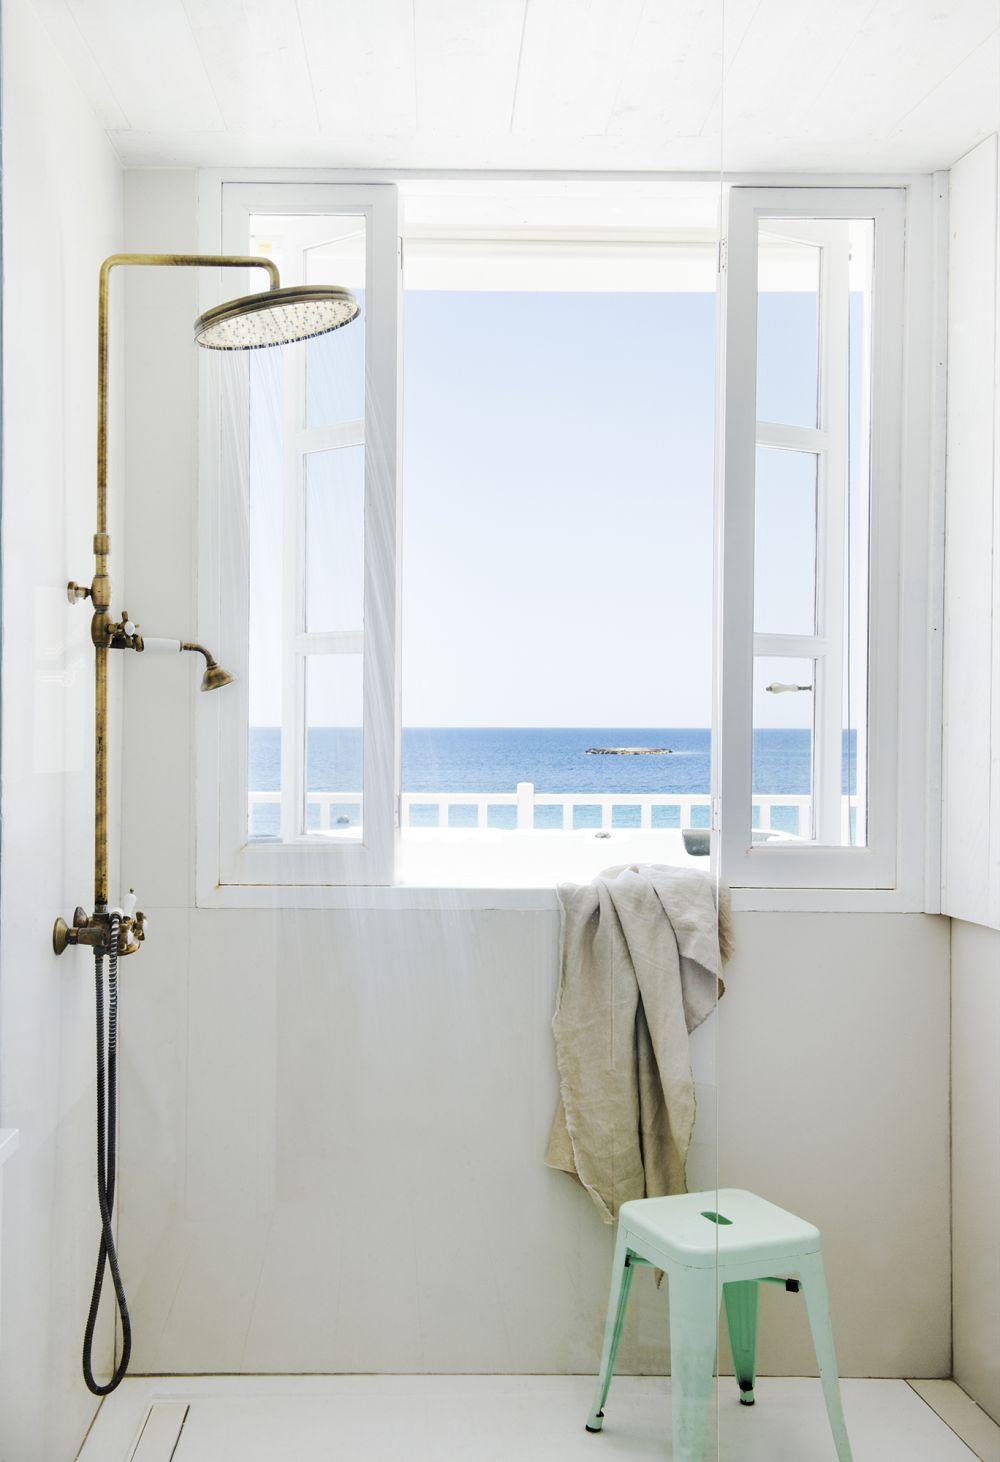 adelaparvu.com despre casa pescareasca modernizata in Mallorca, designer Catalina Socias, Foto ElMueble Stella Rotger (19)